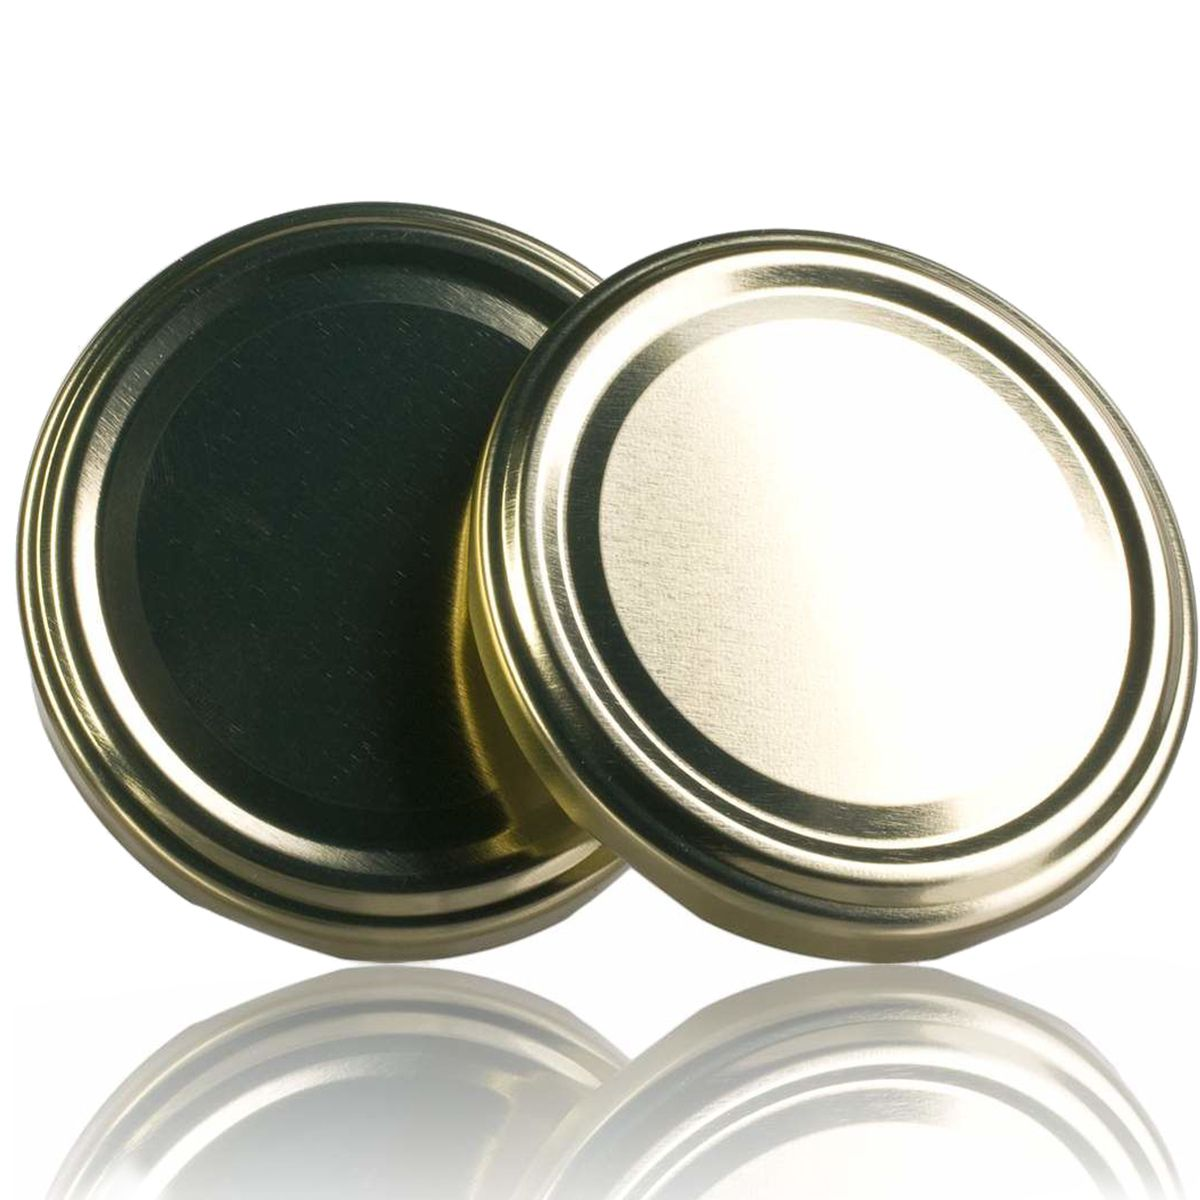 44 Potes Vidro Conserva 200 Ml Tampa Dourada P/ Geleia, Bolo  - EMPÓRIO PACK